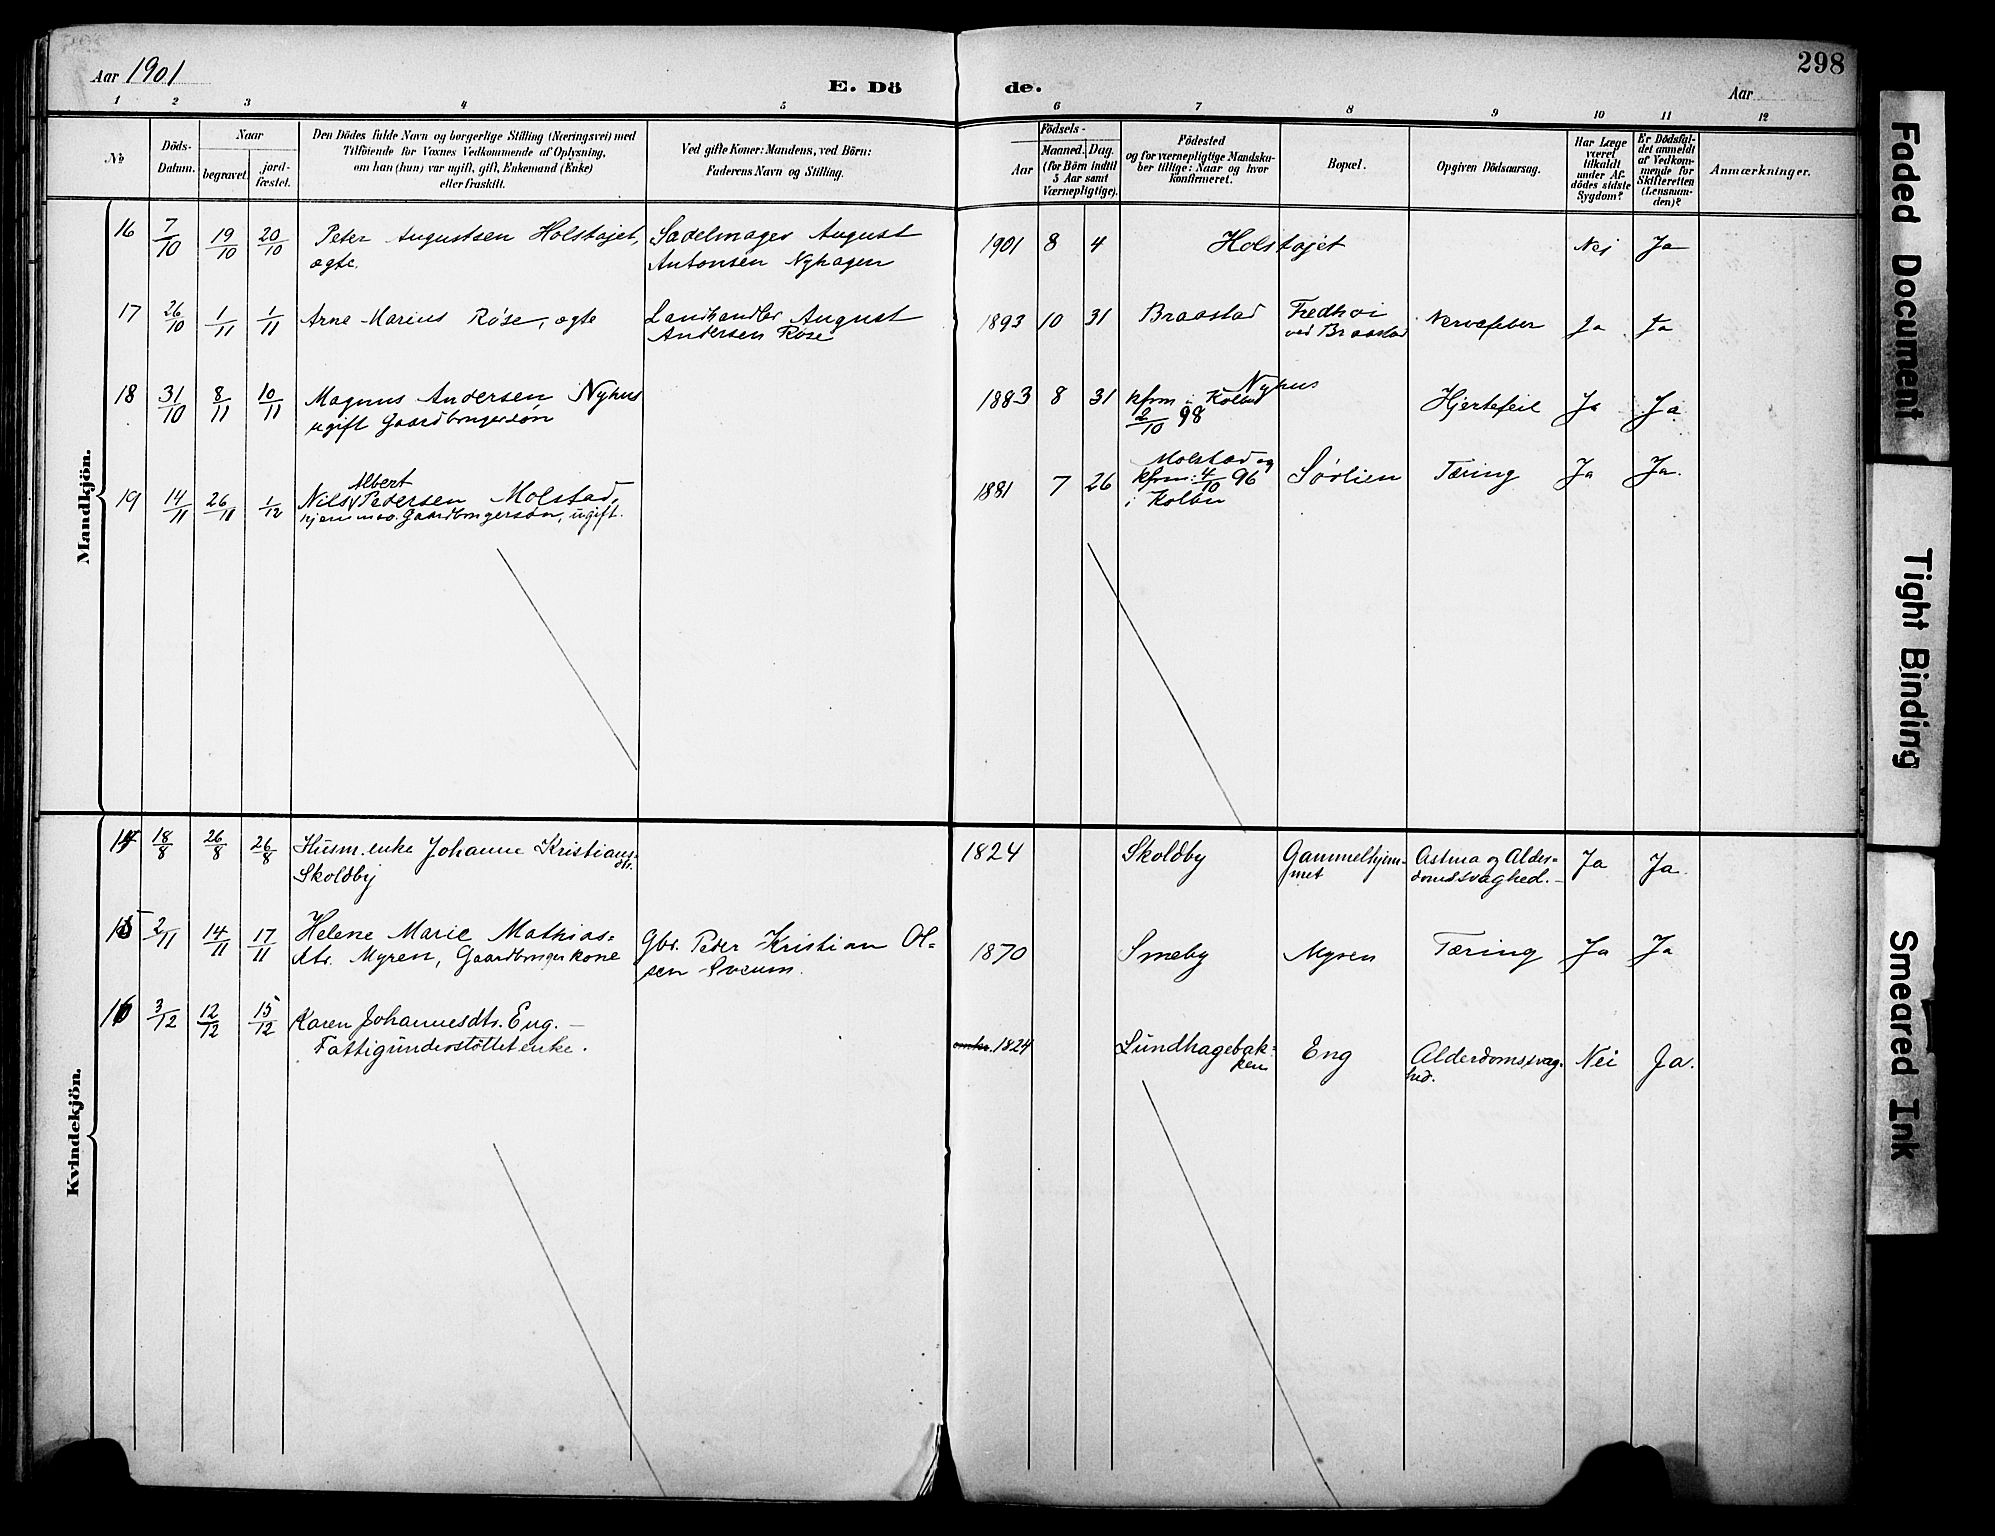 SAH, Vestre Toten prestekontor, H/Ha/Haa/L0013: Ministerialbok nr. 13, 1895-1911, s. 298